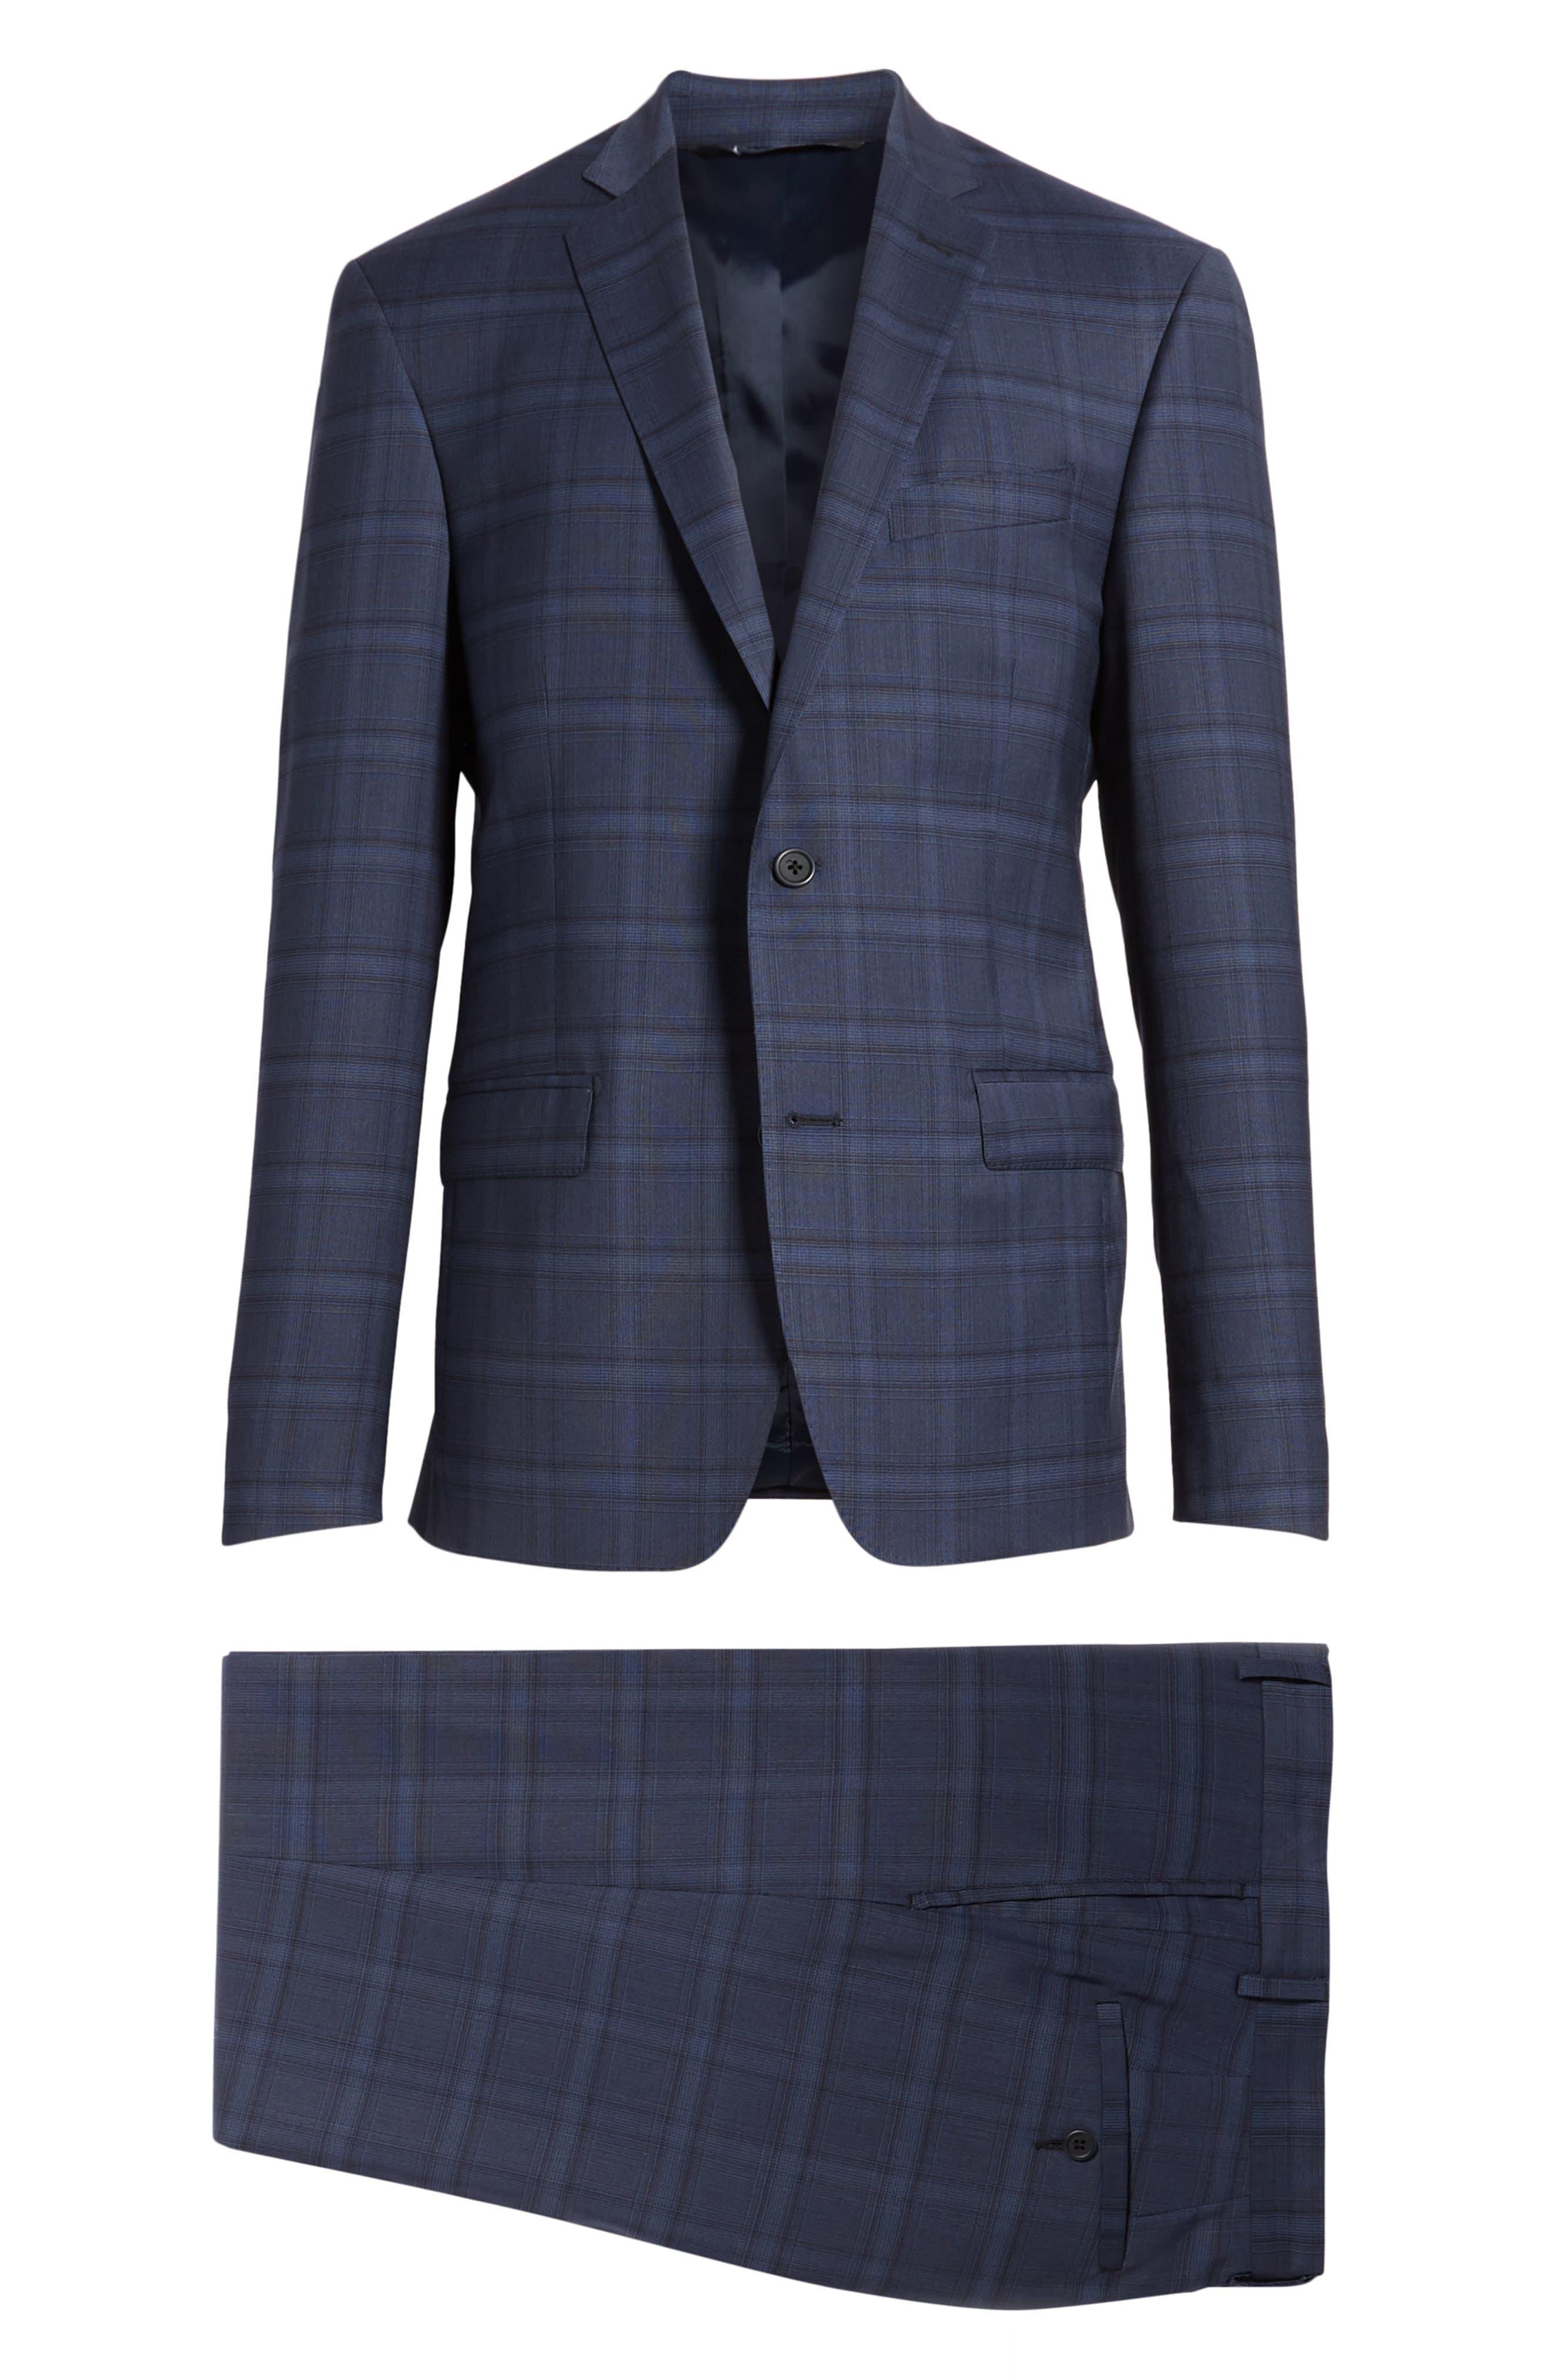 Trim Fit Plaid Stretch Wool Travel Suit,                             Alternate thumbnail 8, color,                             Navy